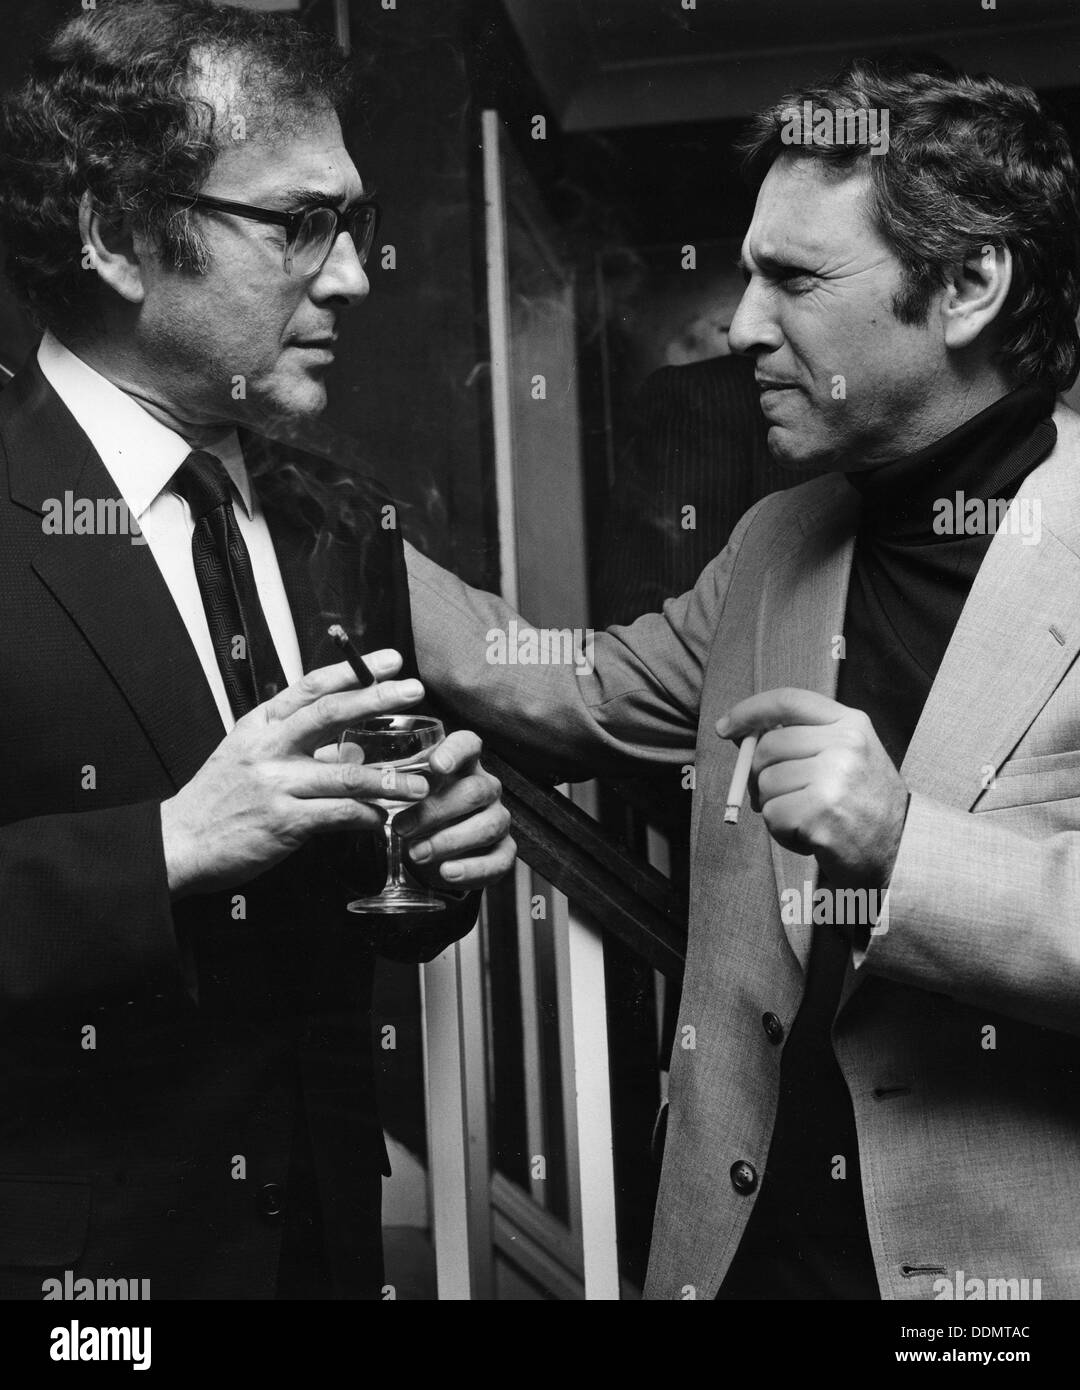 Harold Pinter (1930- ), British playwright. Artist: Sidney Harris Stock Photo